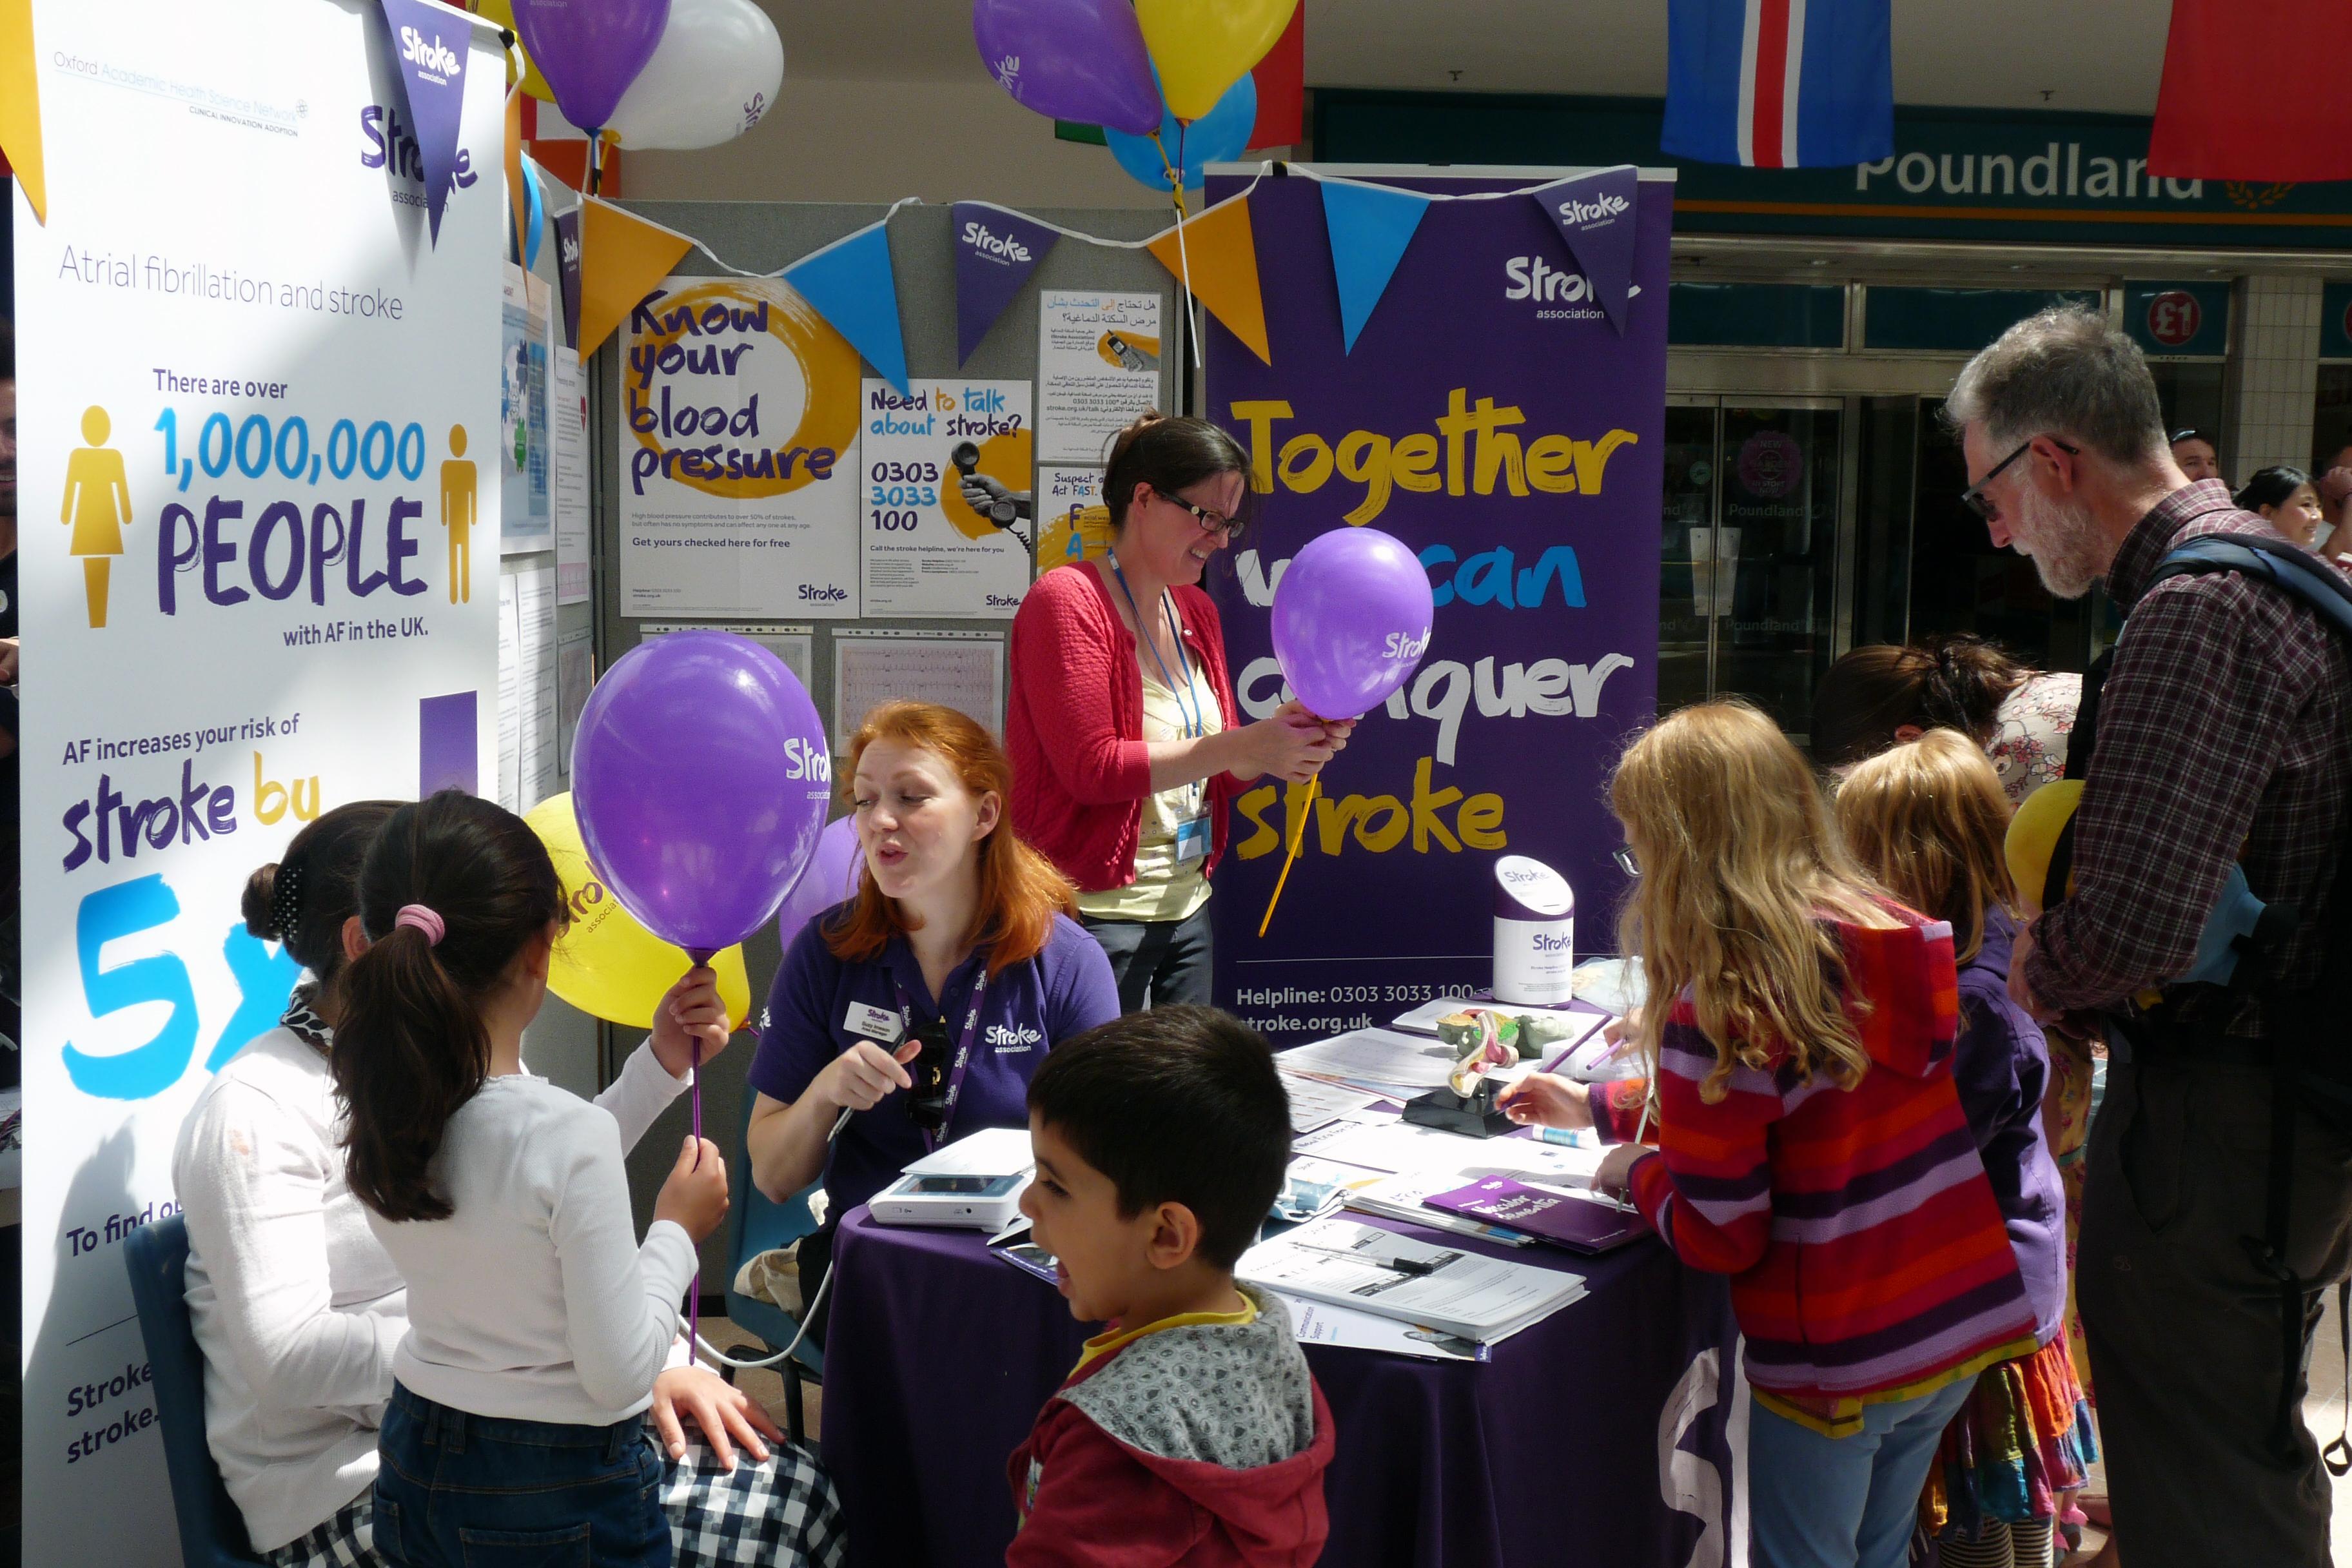 Oxfordshire science festival health fair